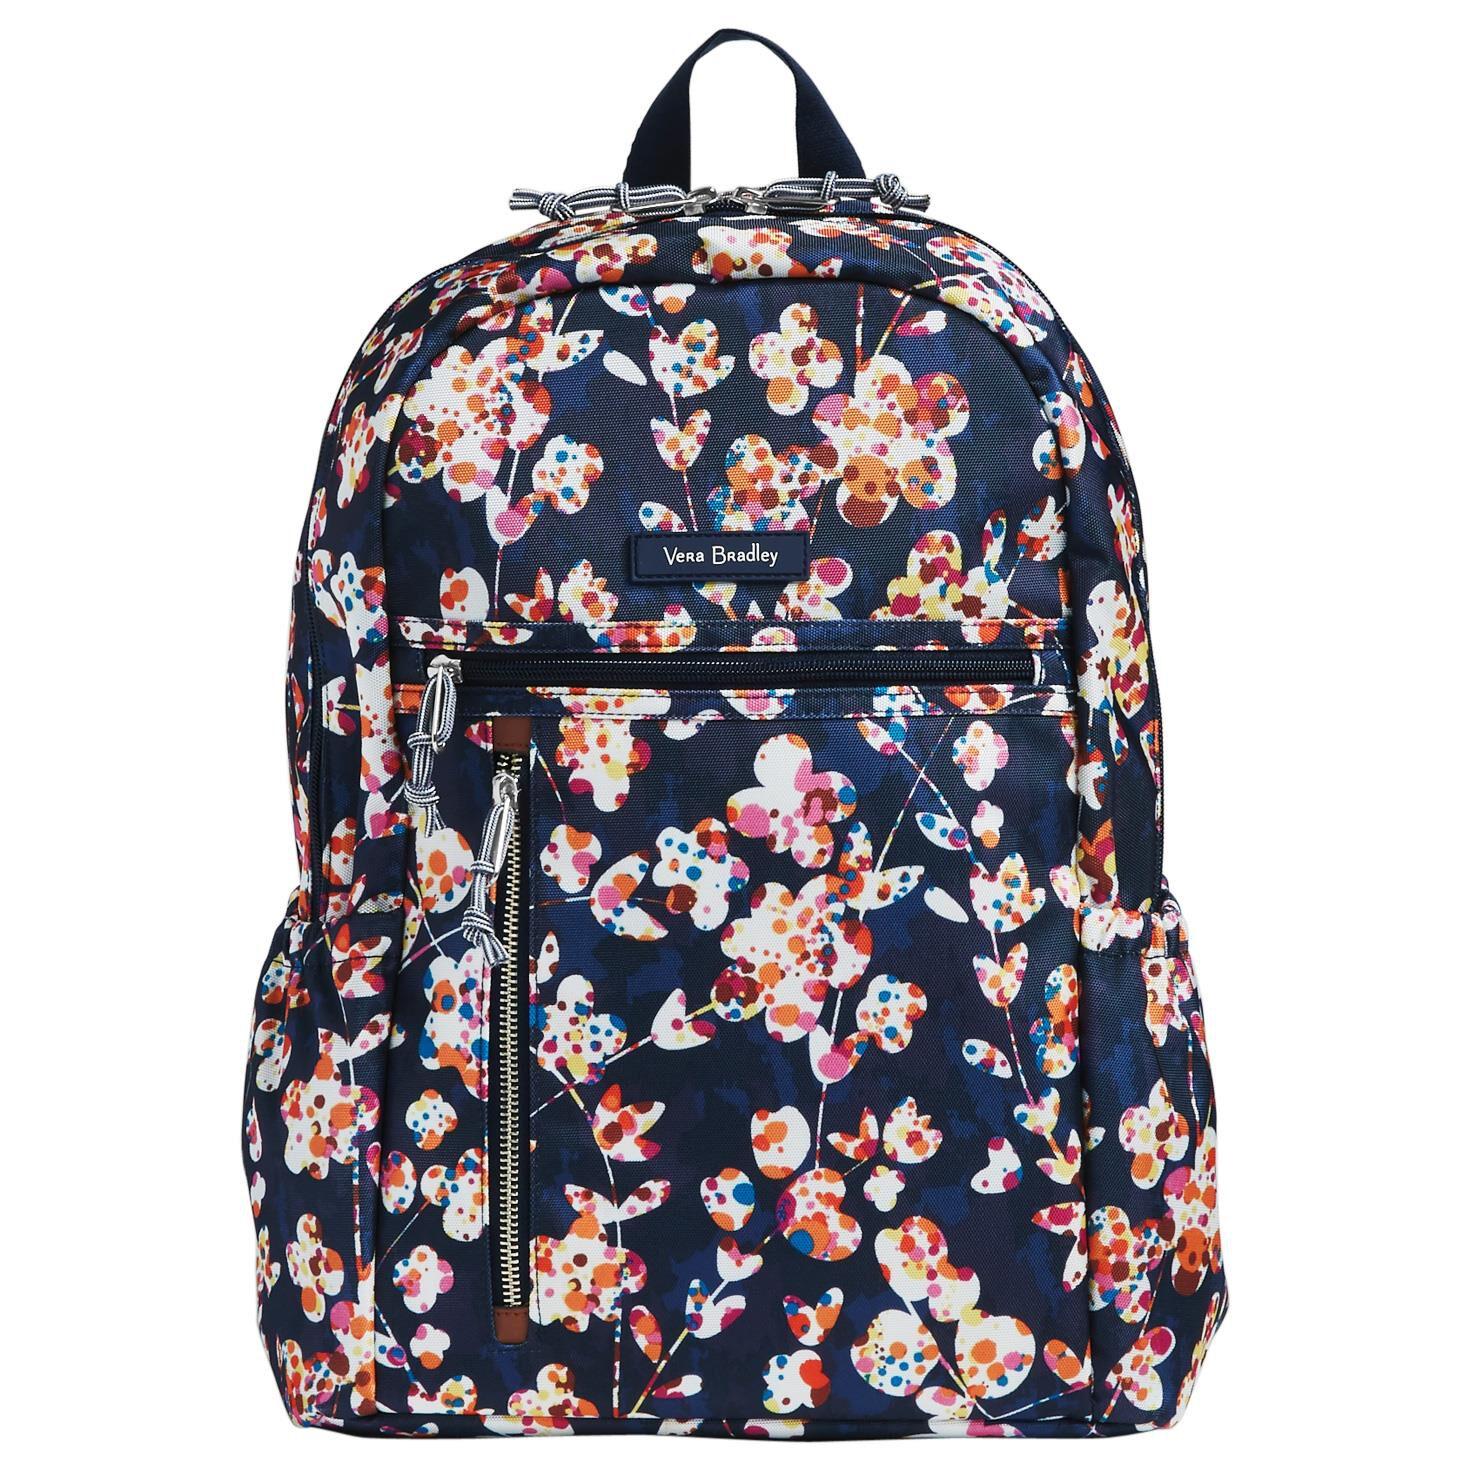 Where to find cheap vera bradley backpacks ken chad consulting ltd where to find cheap vera bradley backpacks izmirmasajfo